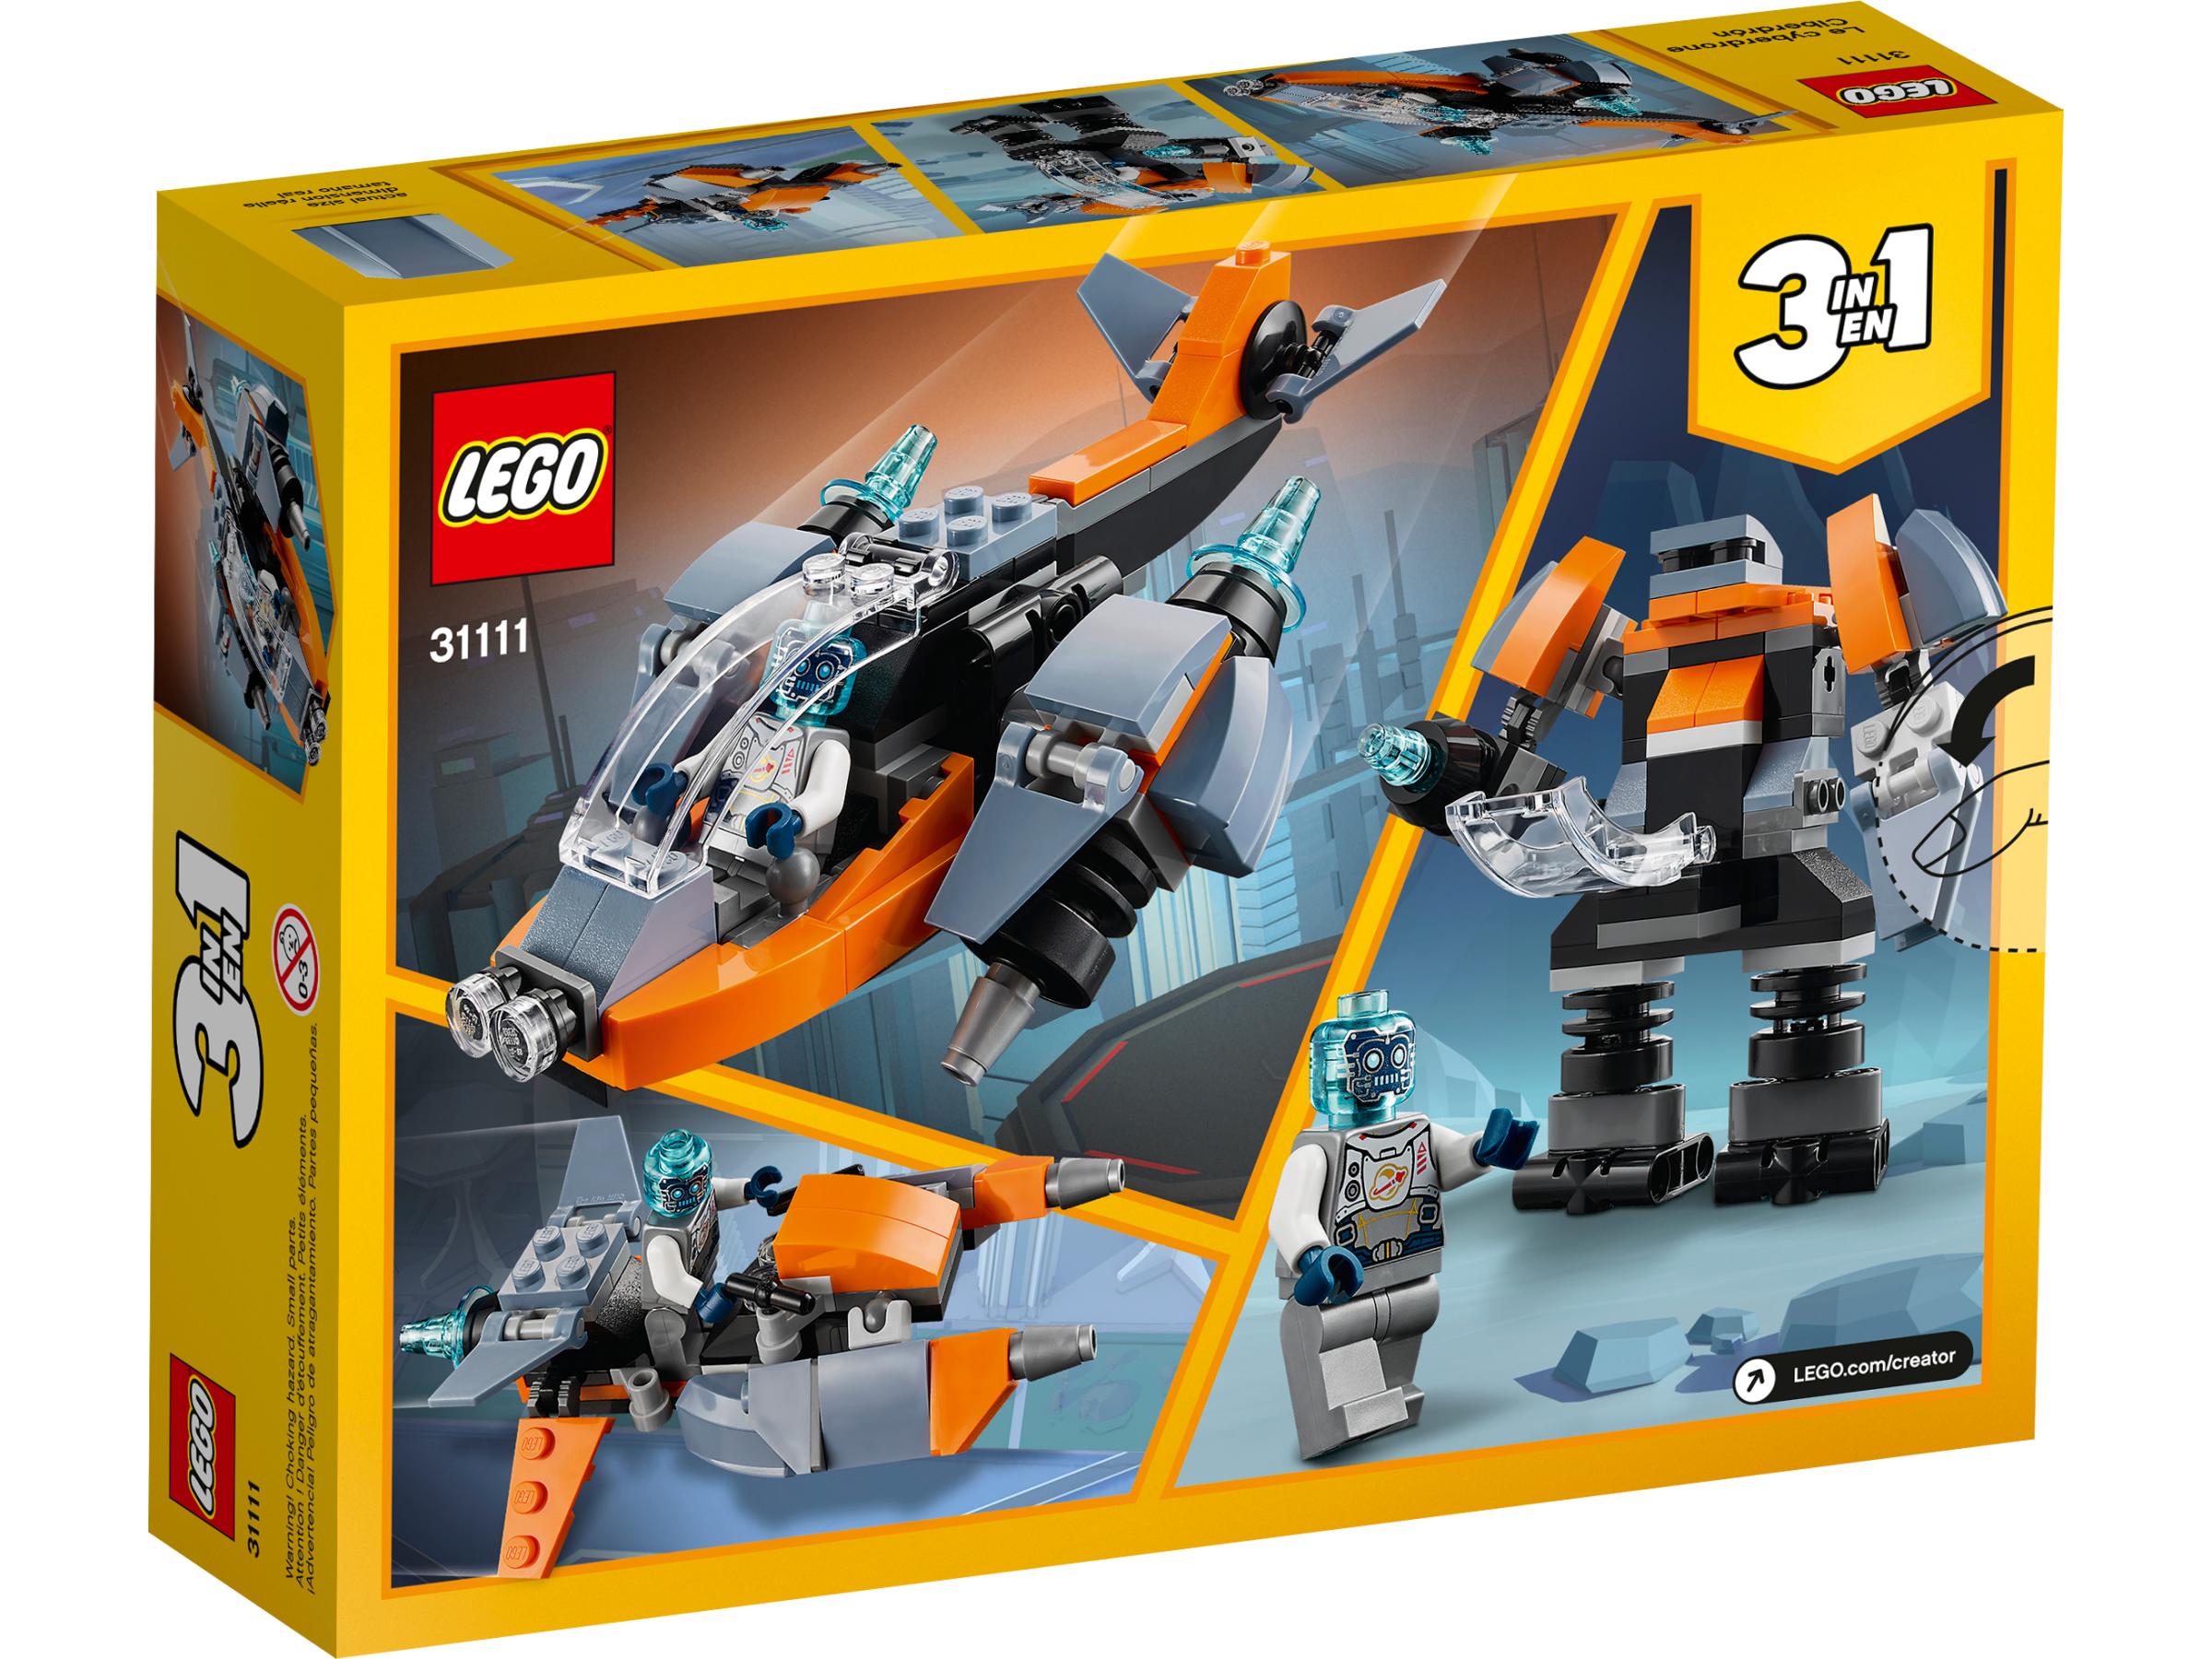 ciberdrone-lego-creator-3-em-1